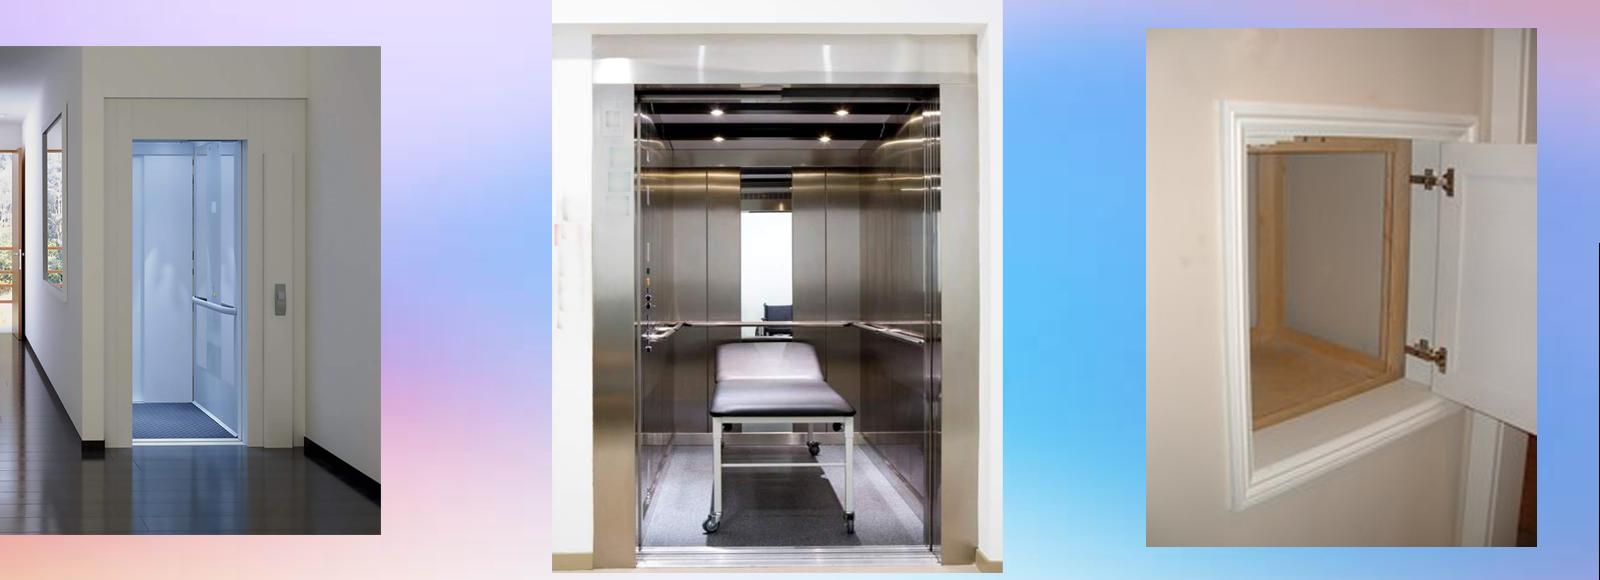 Hospital elevators, Dumb waiters